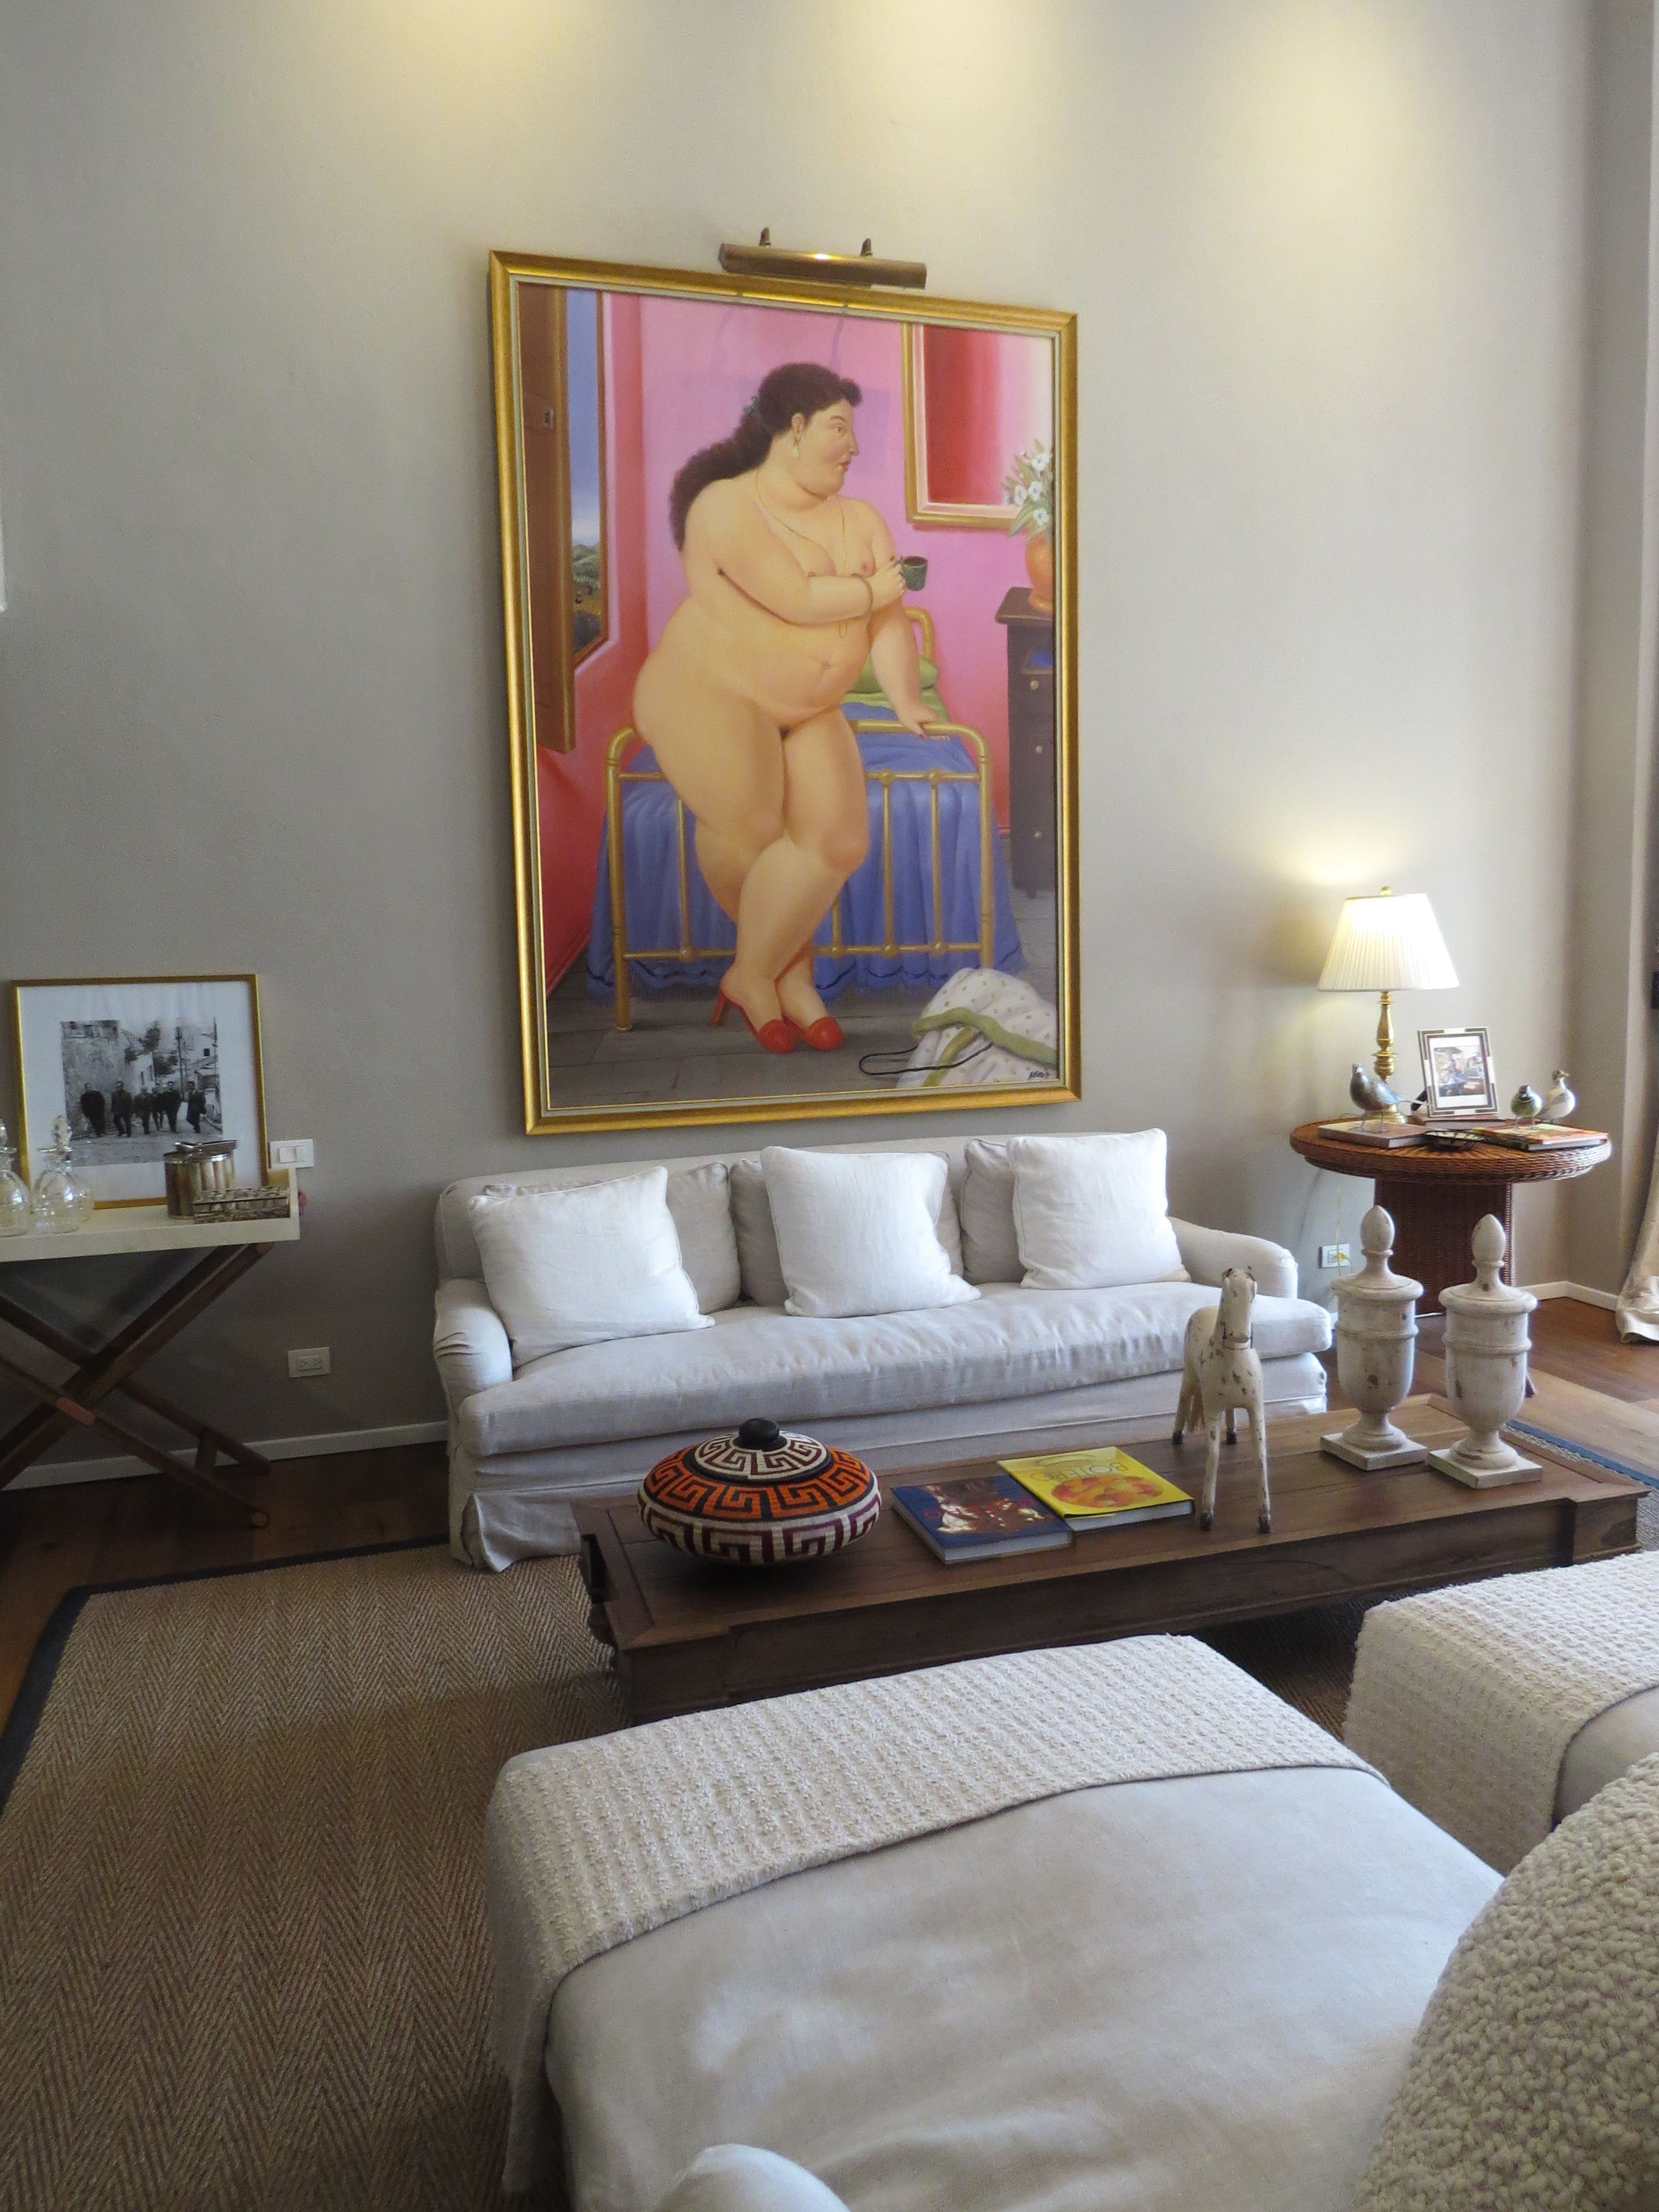 Botero Suite, Sofitel Legend Santa Clara, Cartagena De